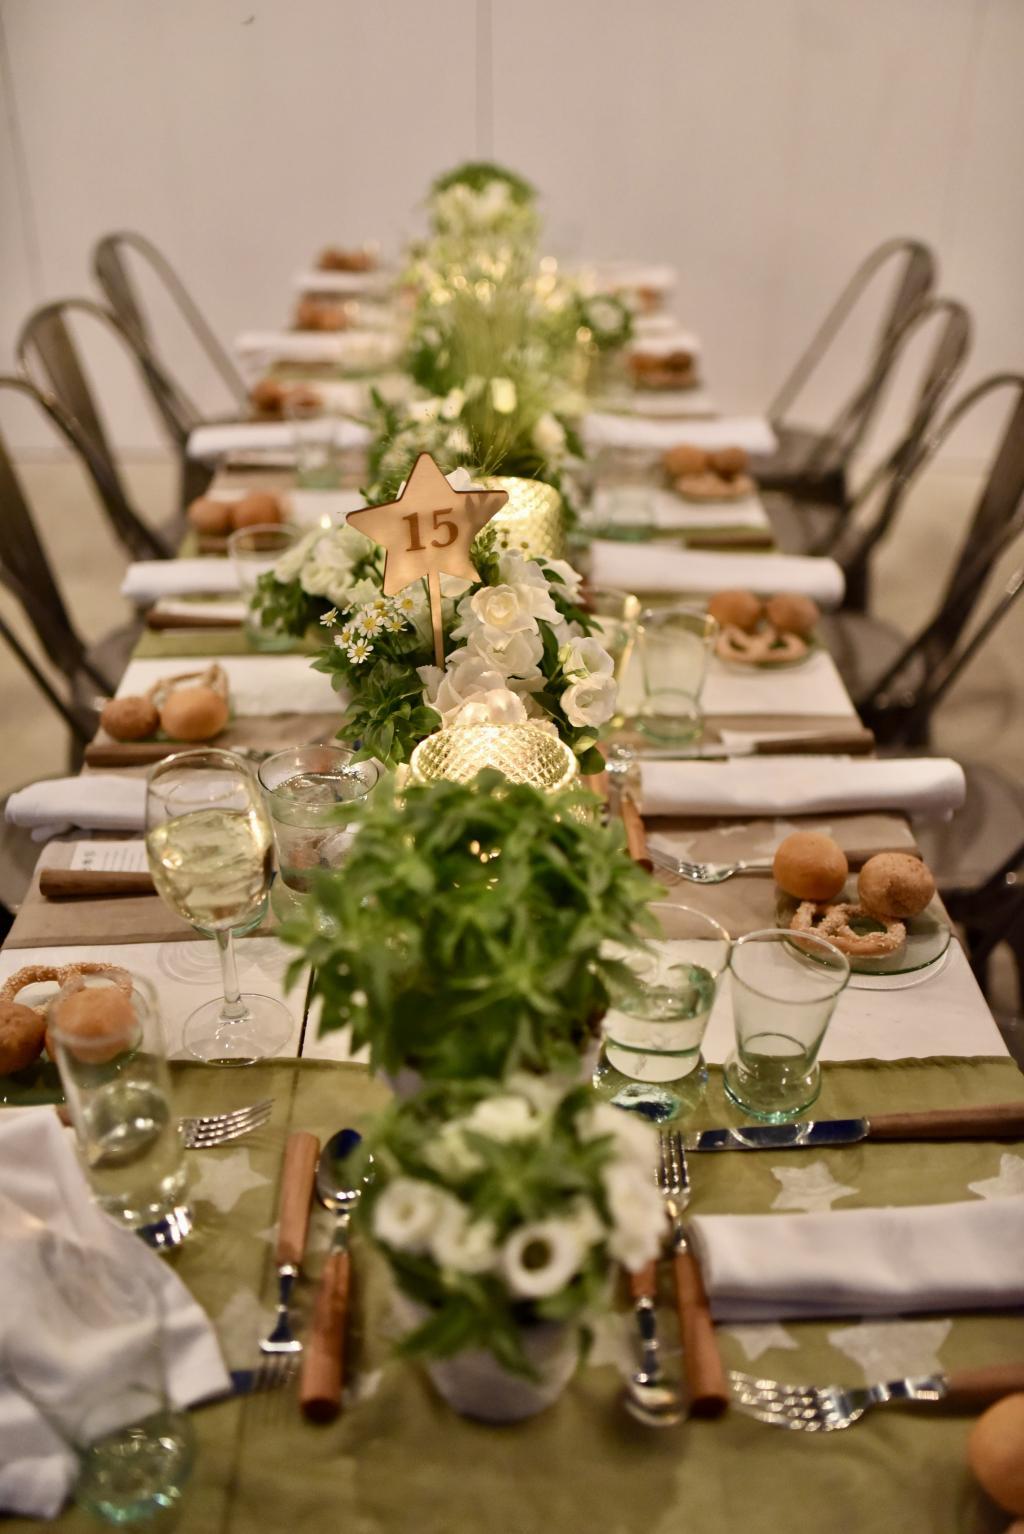 K&K Skiathos wedding - Image 20